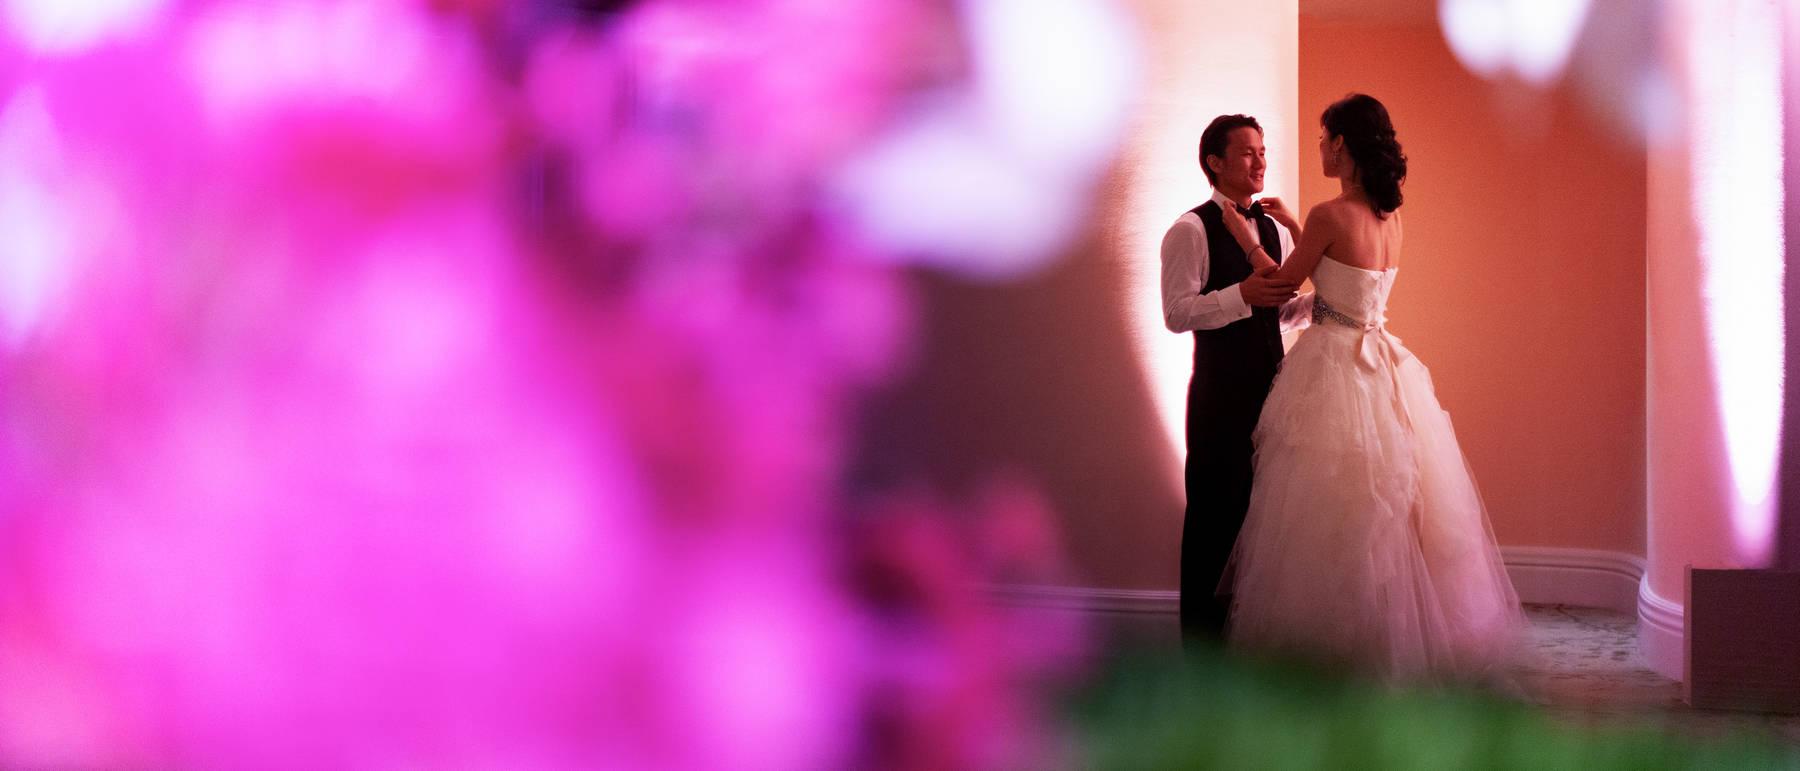 johnandjoseph-wedding-photographer-hz-slider-330